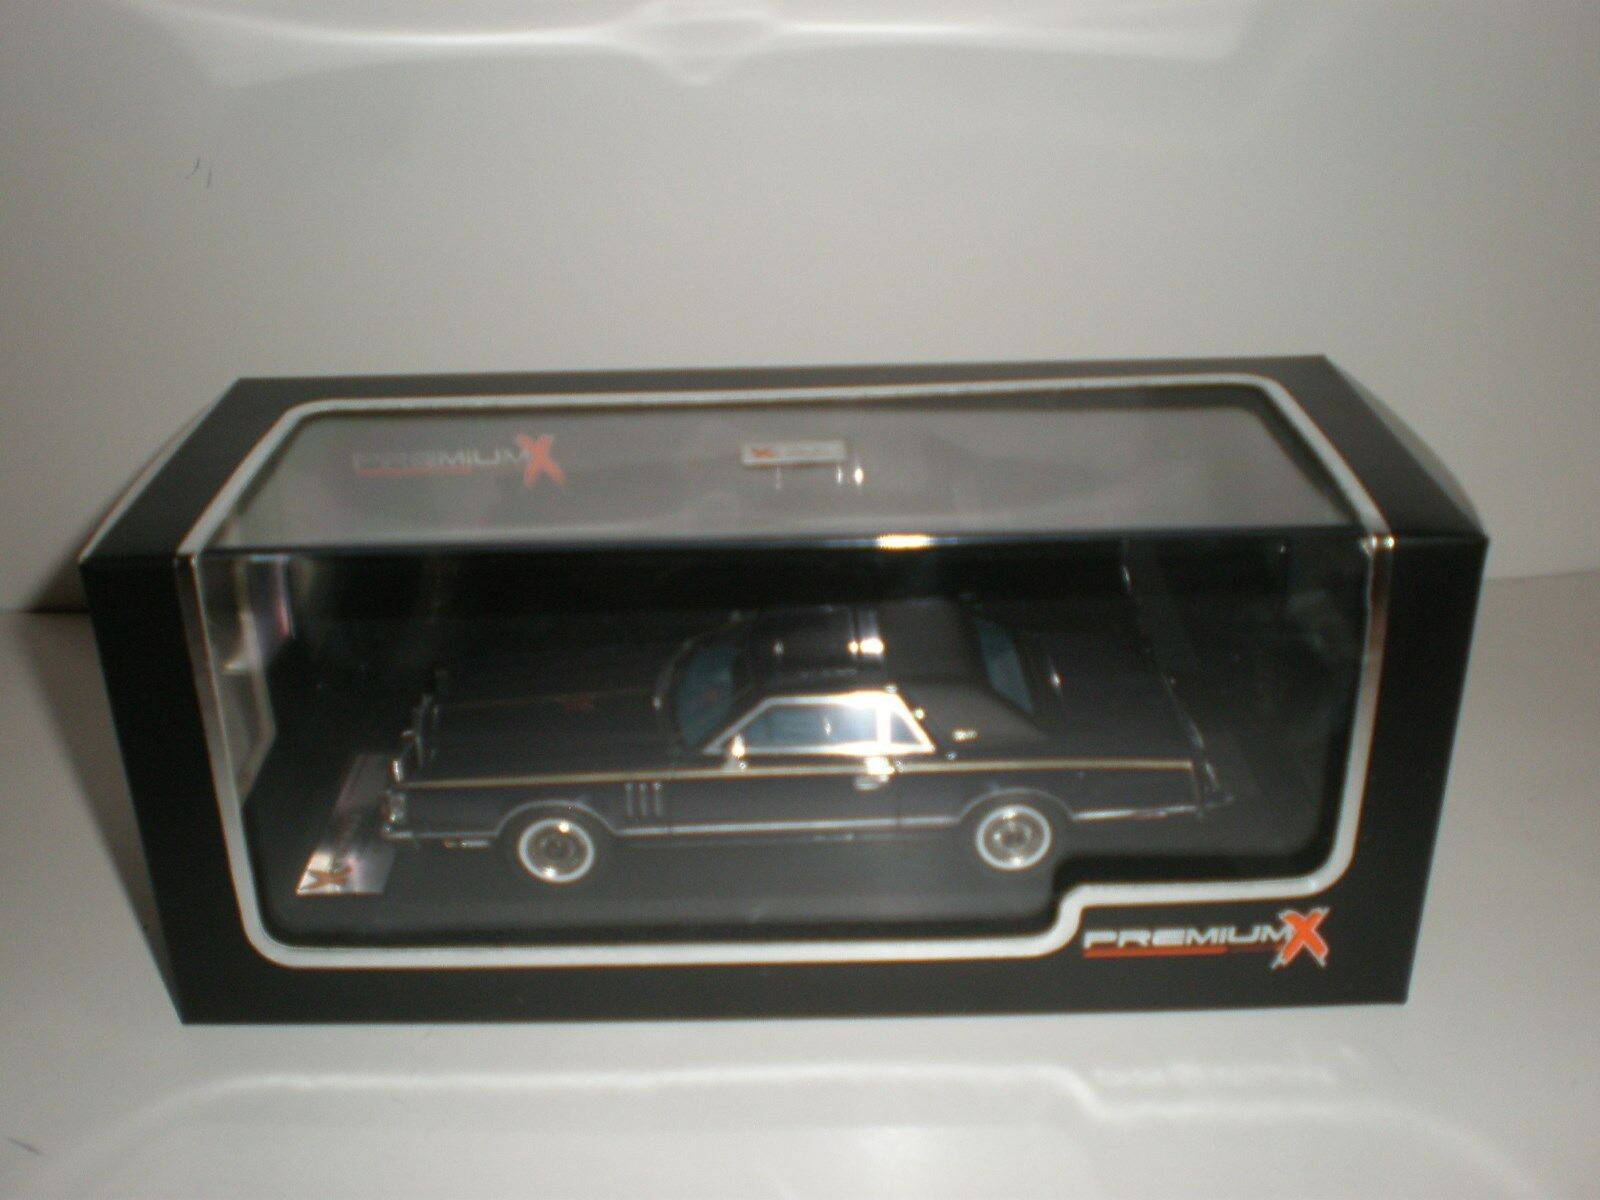 precios mas bajos 1 43 43 43 1979 Lincoln Continental Mk V Ixo Premium X Azul de medianoche  Esperando por ti